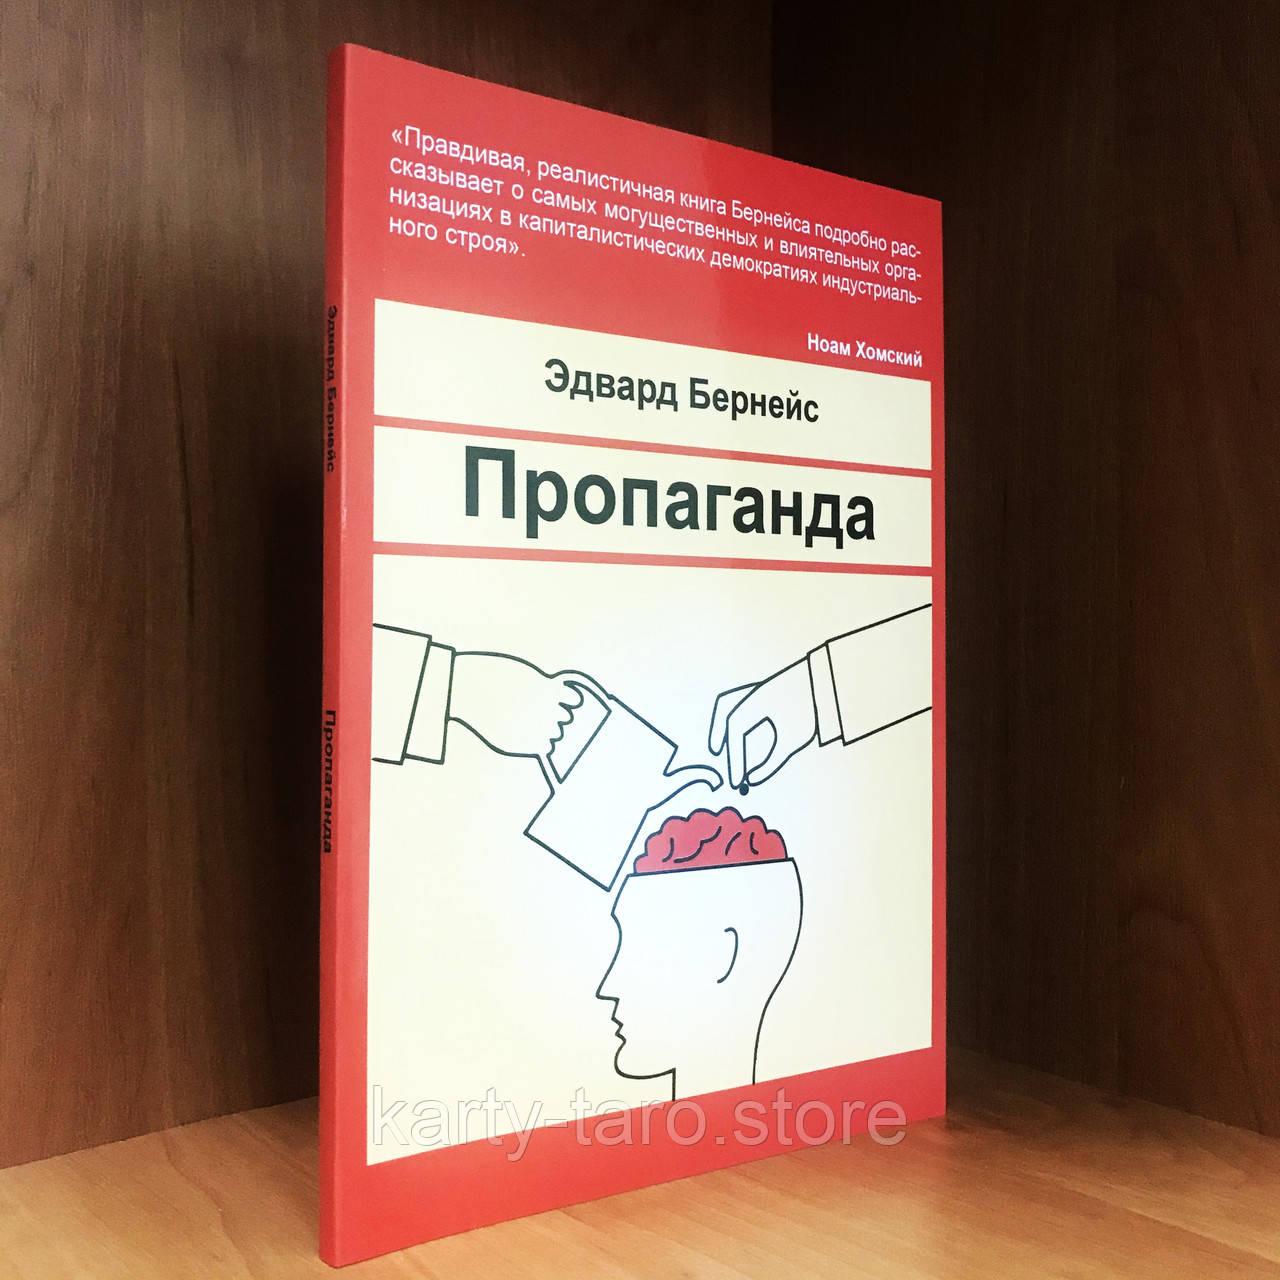 Книга Пропаганда - Едвард Бернейс